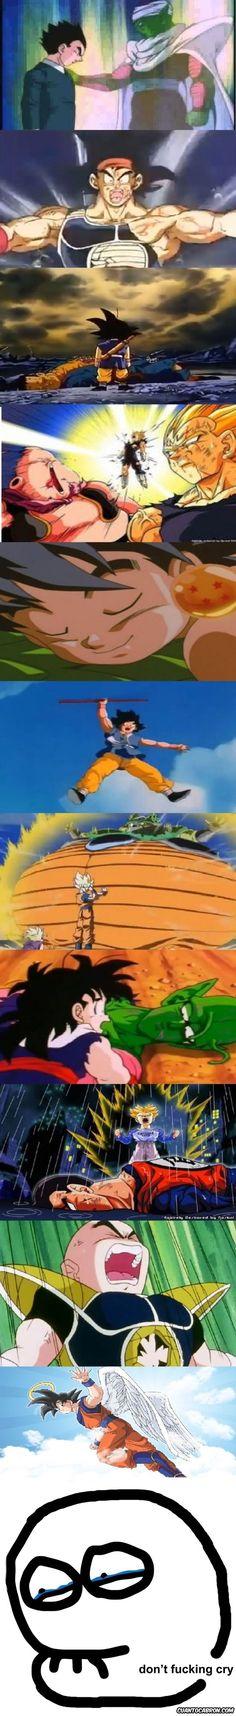 Dragon Ball sabía como provocarte un nudo en la garganta